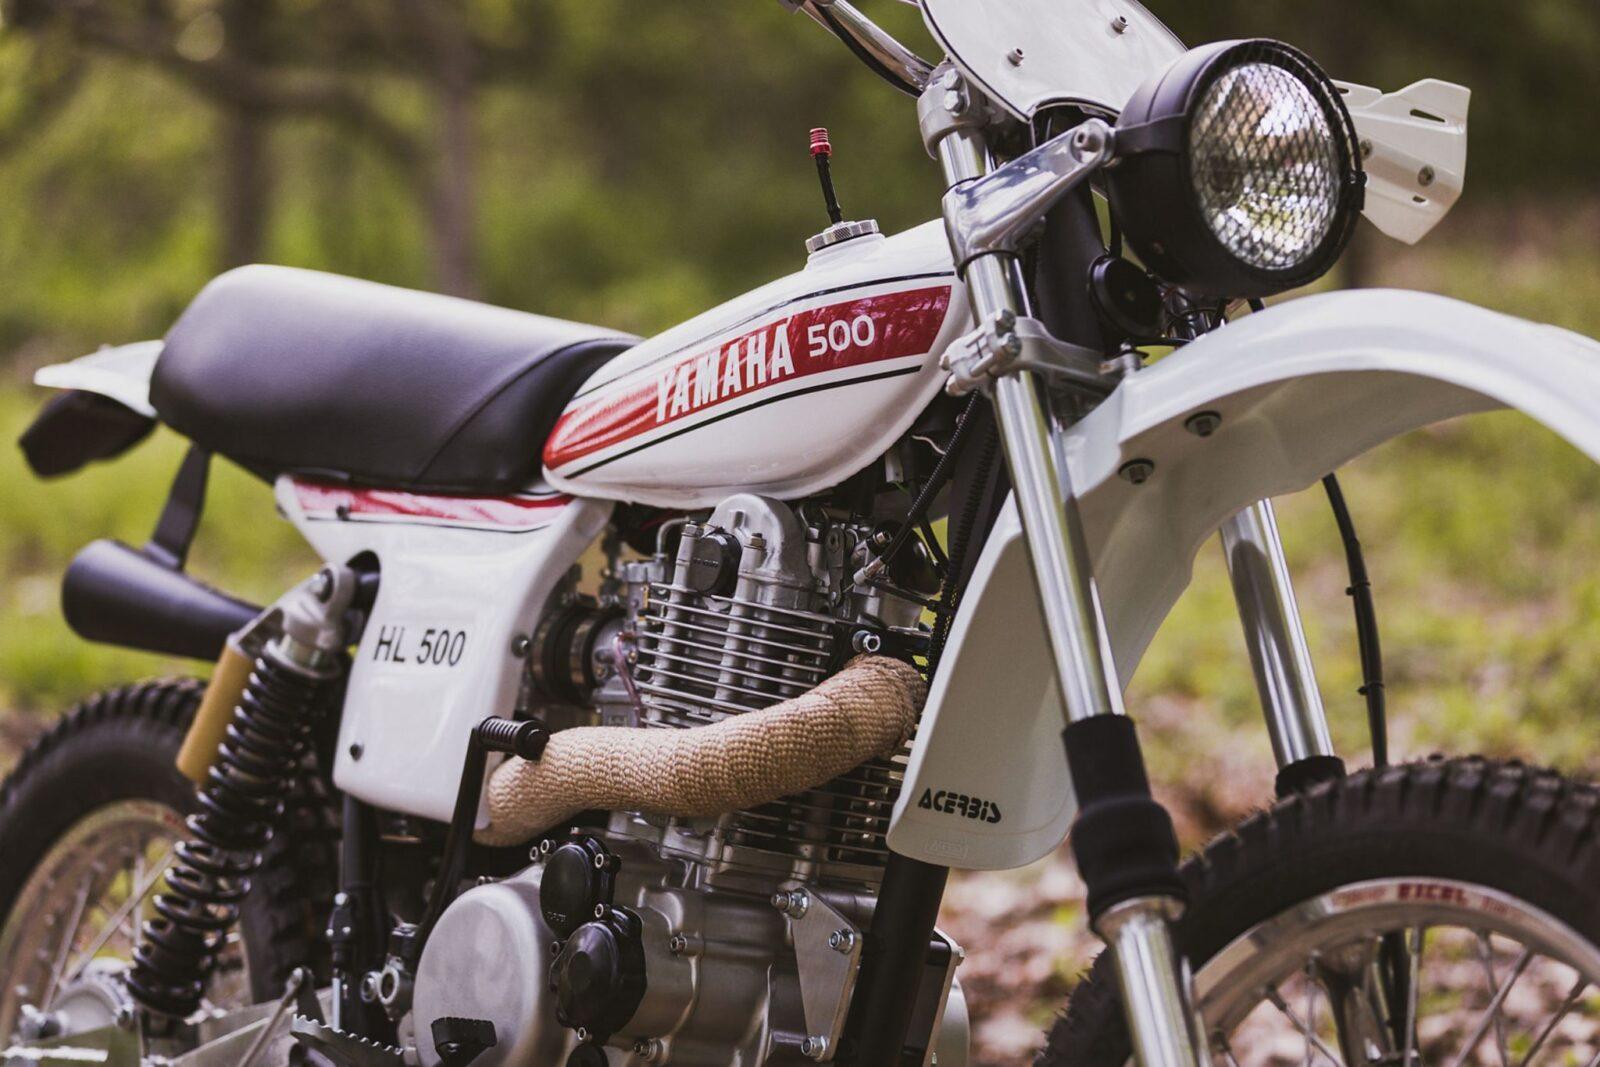 yamaha hl500 motorcycle 22 1600x1067 - Husky Restorations Yamaha HL500